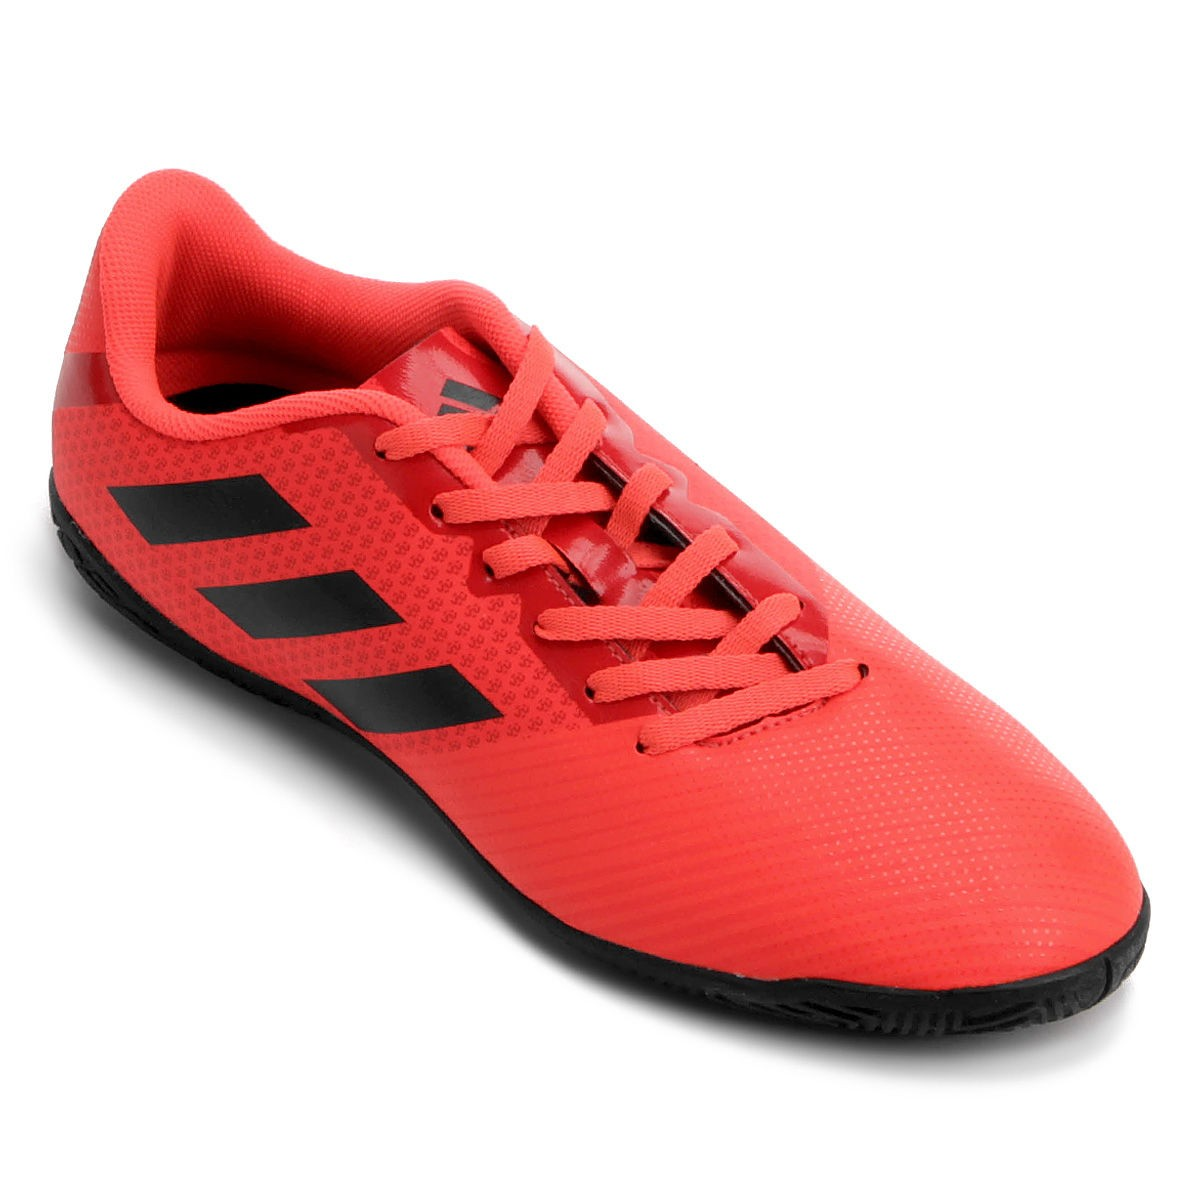 f5b27330bd29a Chuteira Futsal Adidas Artilheira ll IN Masculino - Laranja/Preto ...